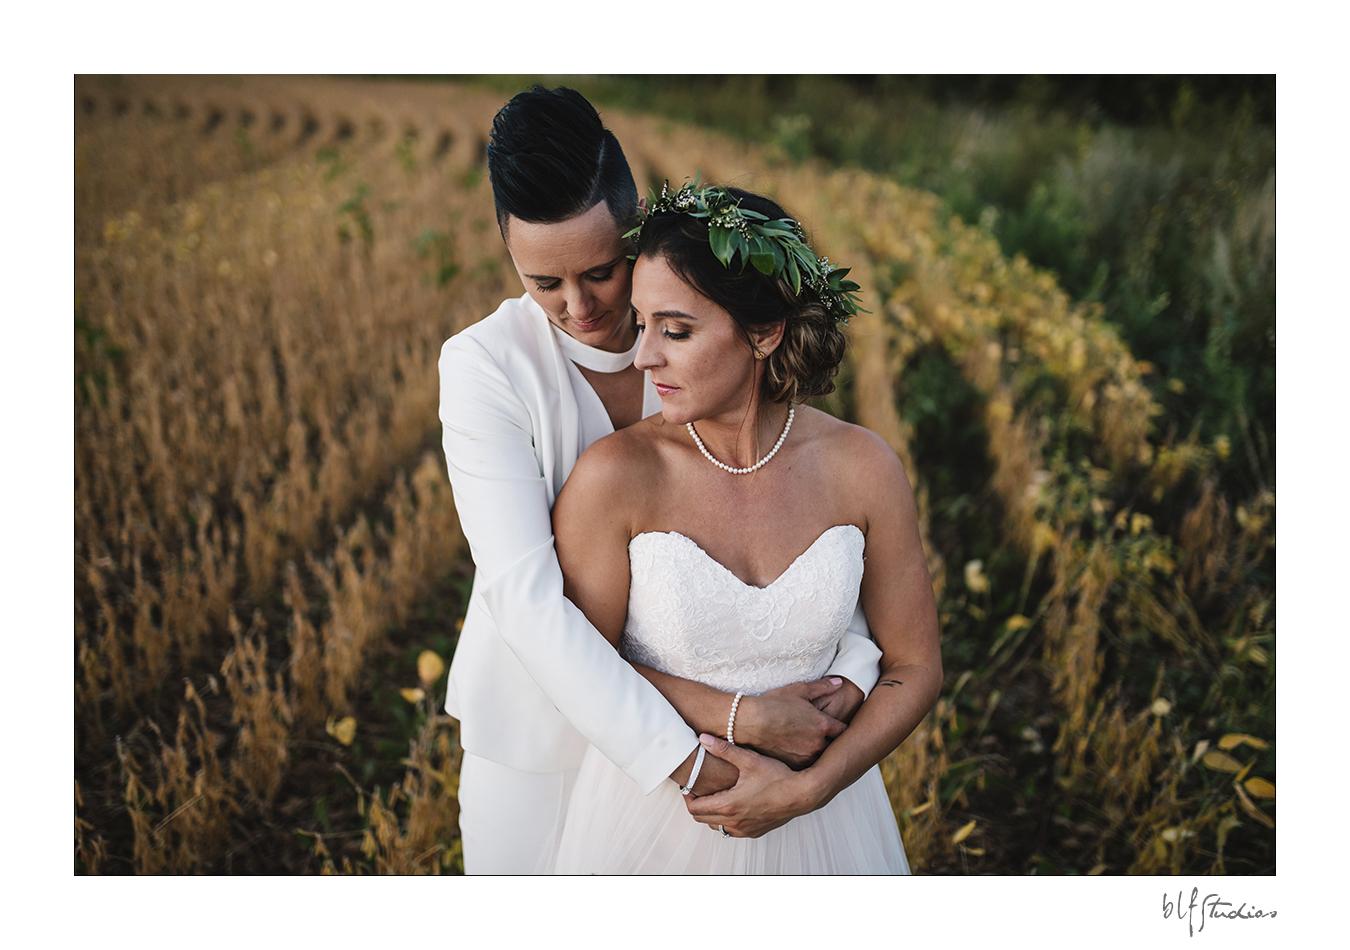 050-winnipeg-hitchnpost-wedding-marla-alana.jpg